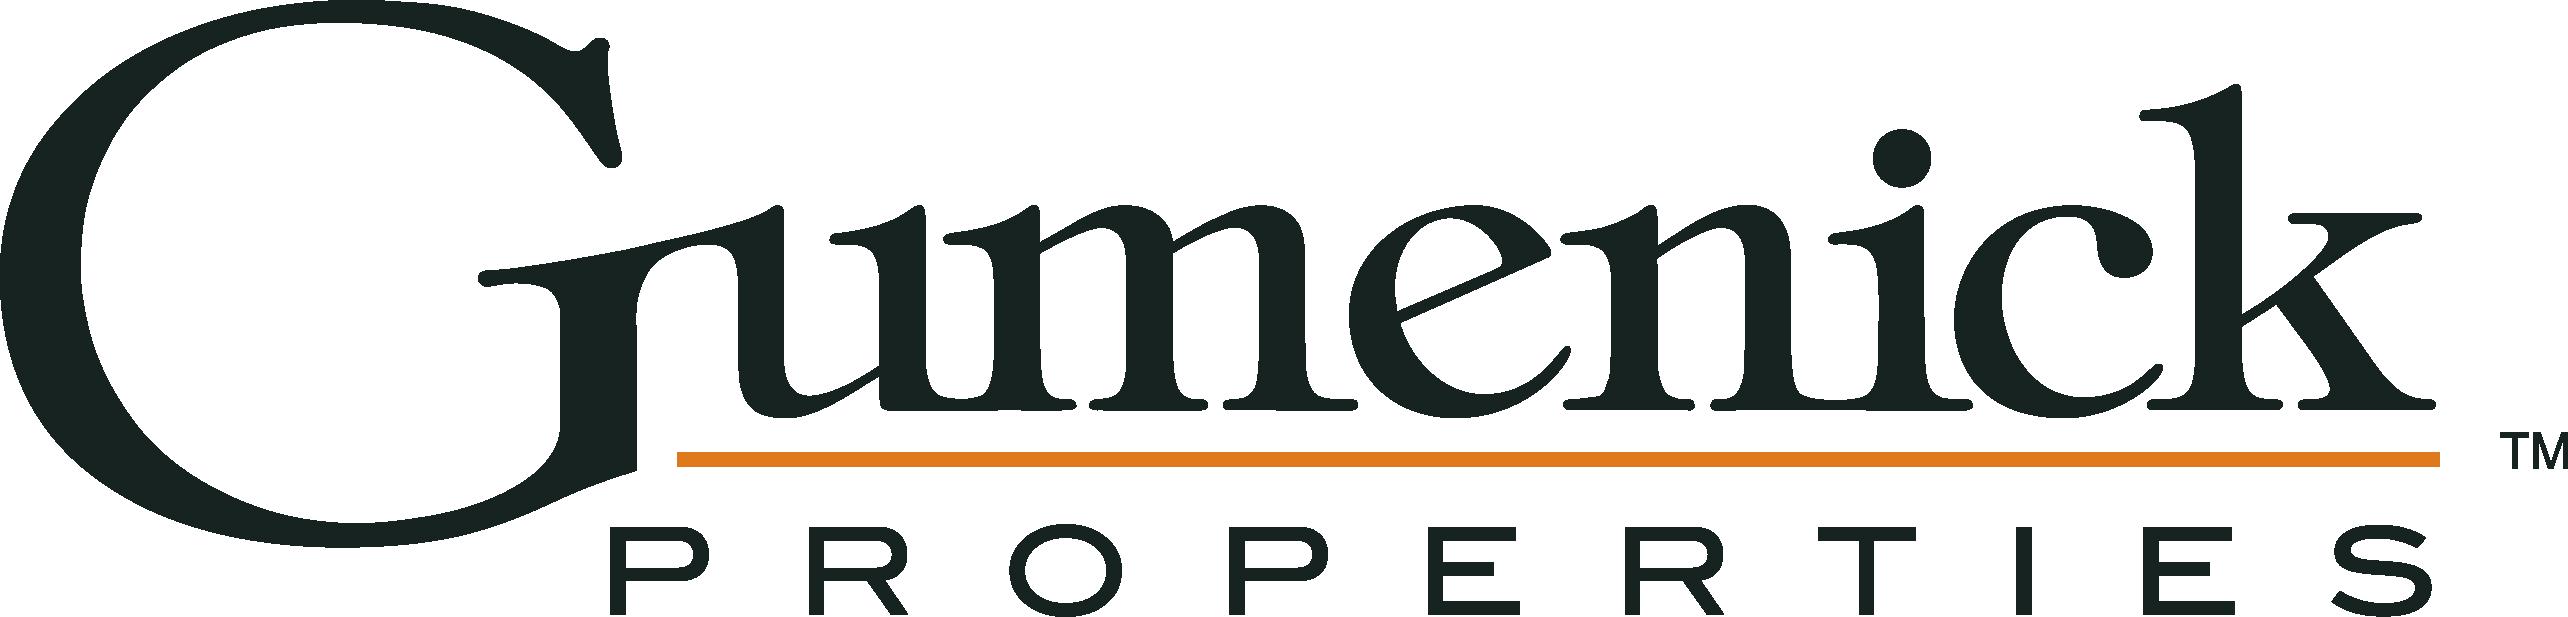 Gumenick Properties logo